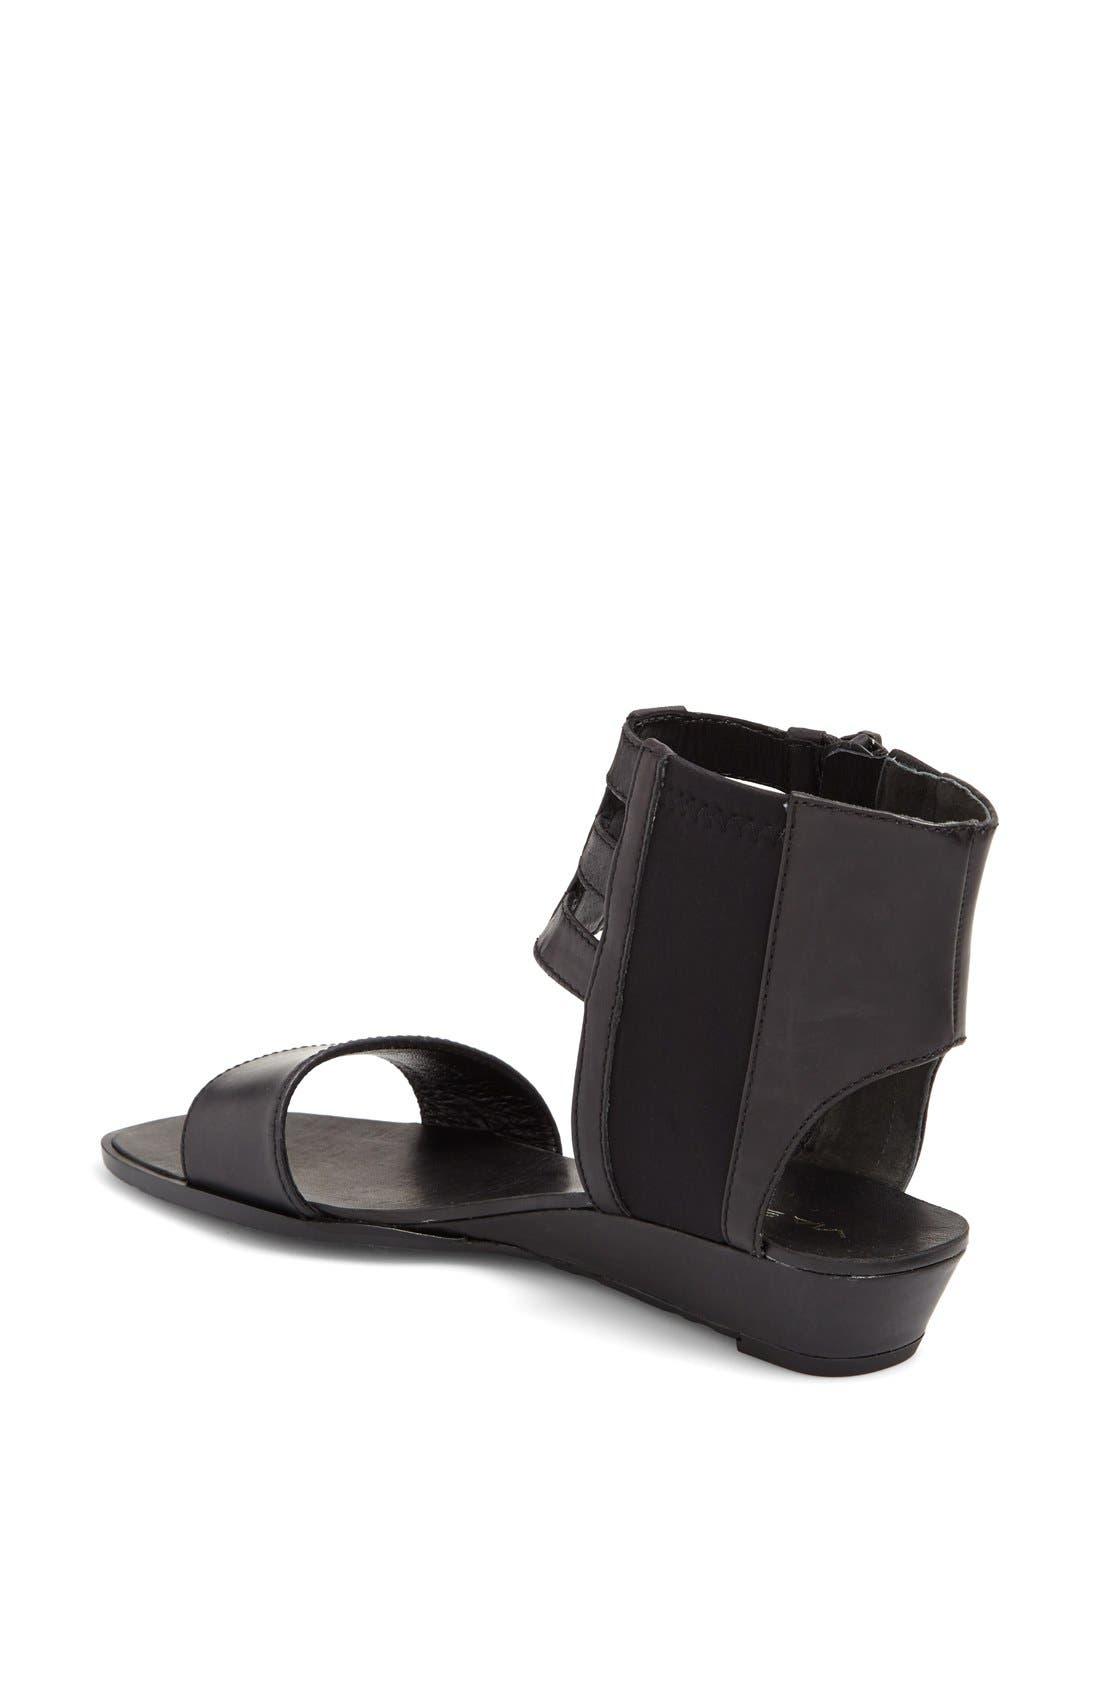 Alternate Image 2  - Via Spiga 'Patrice' Leather Sandal